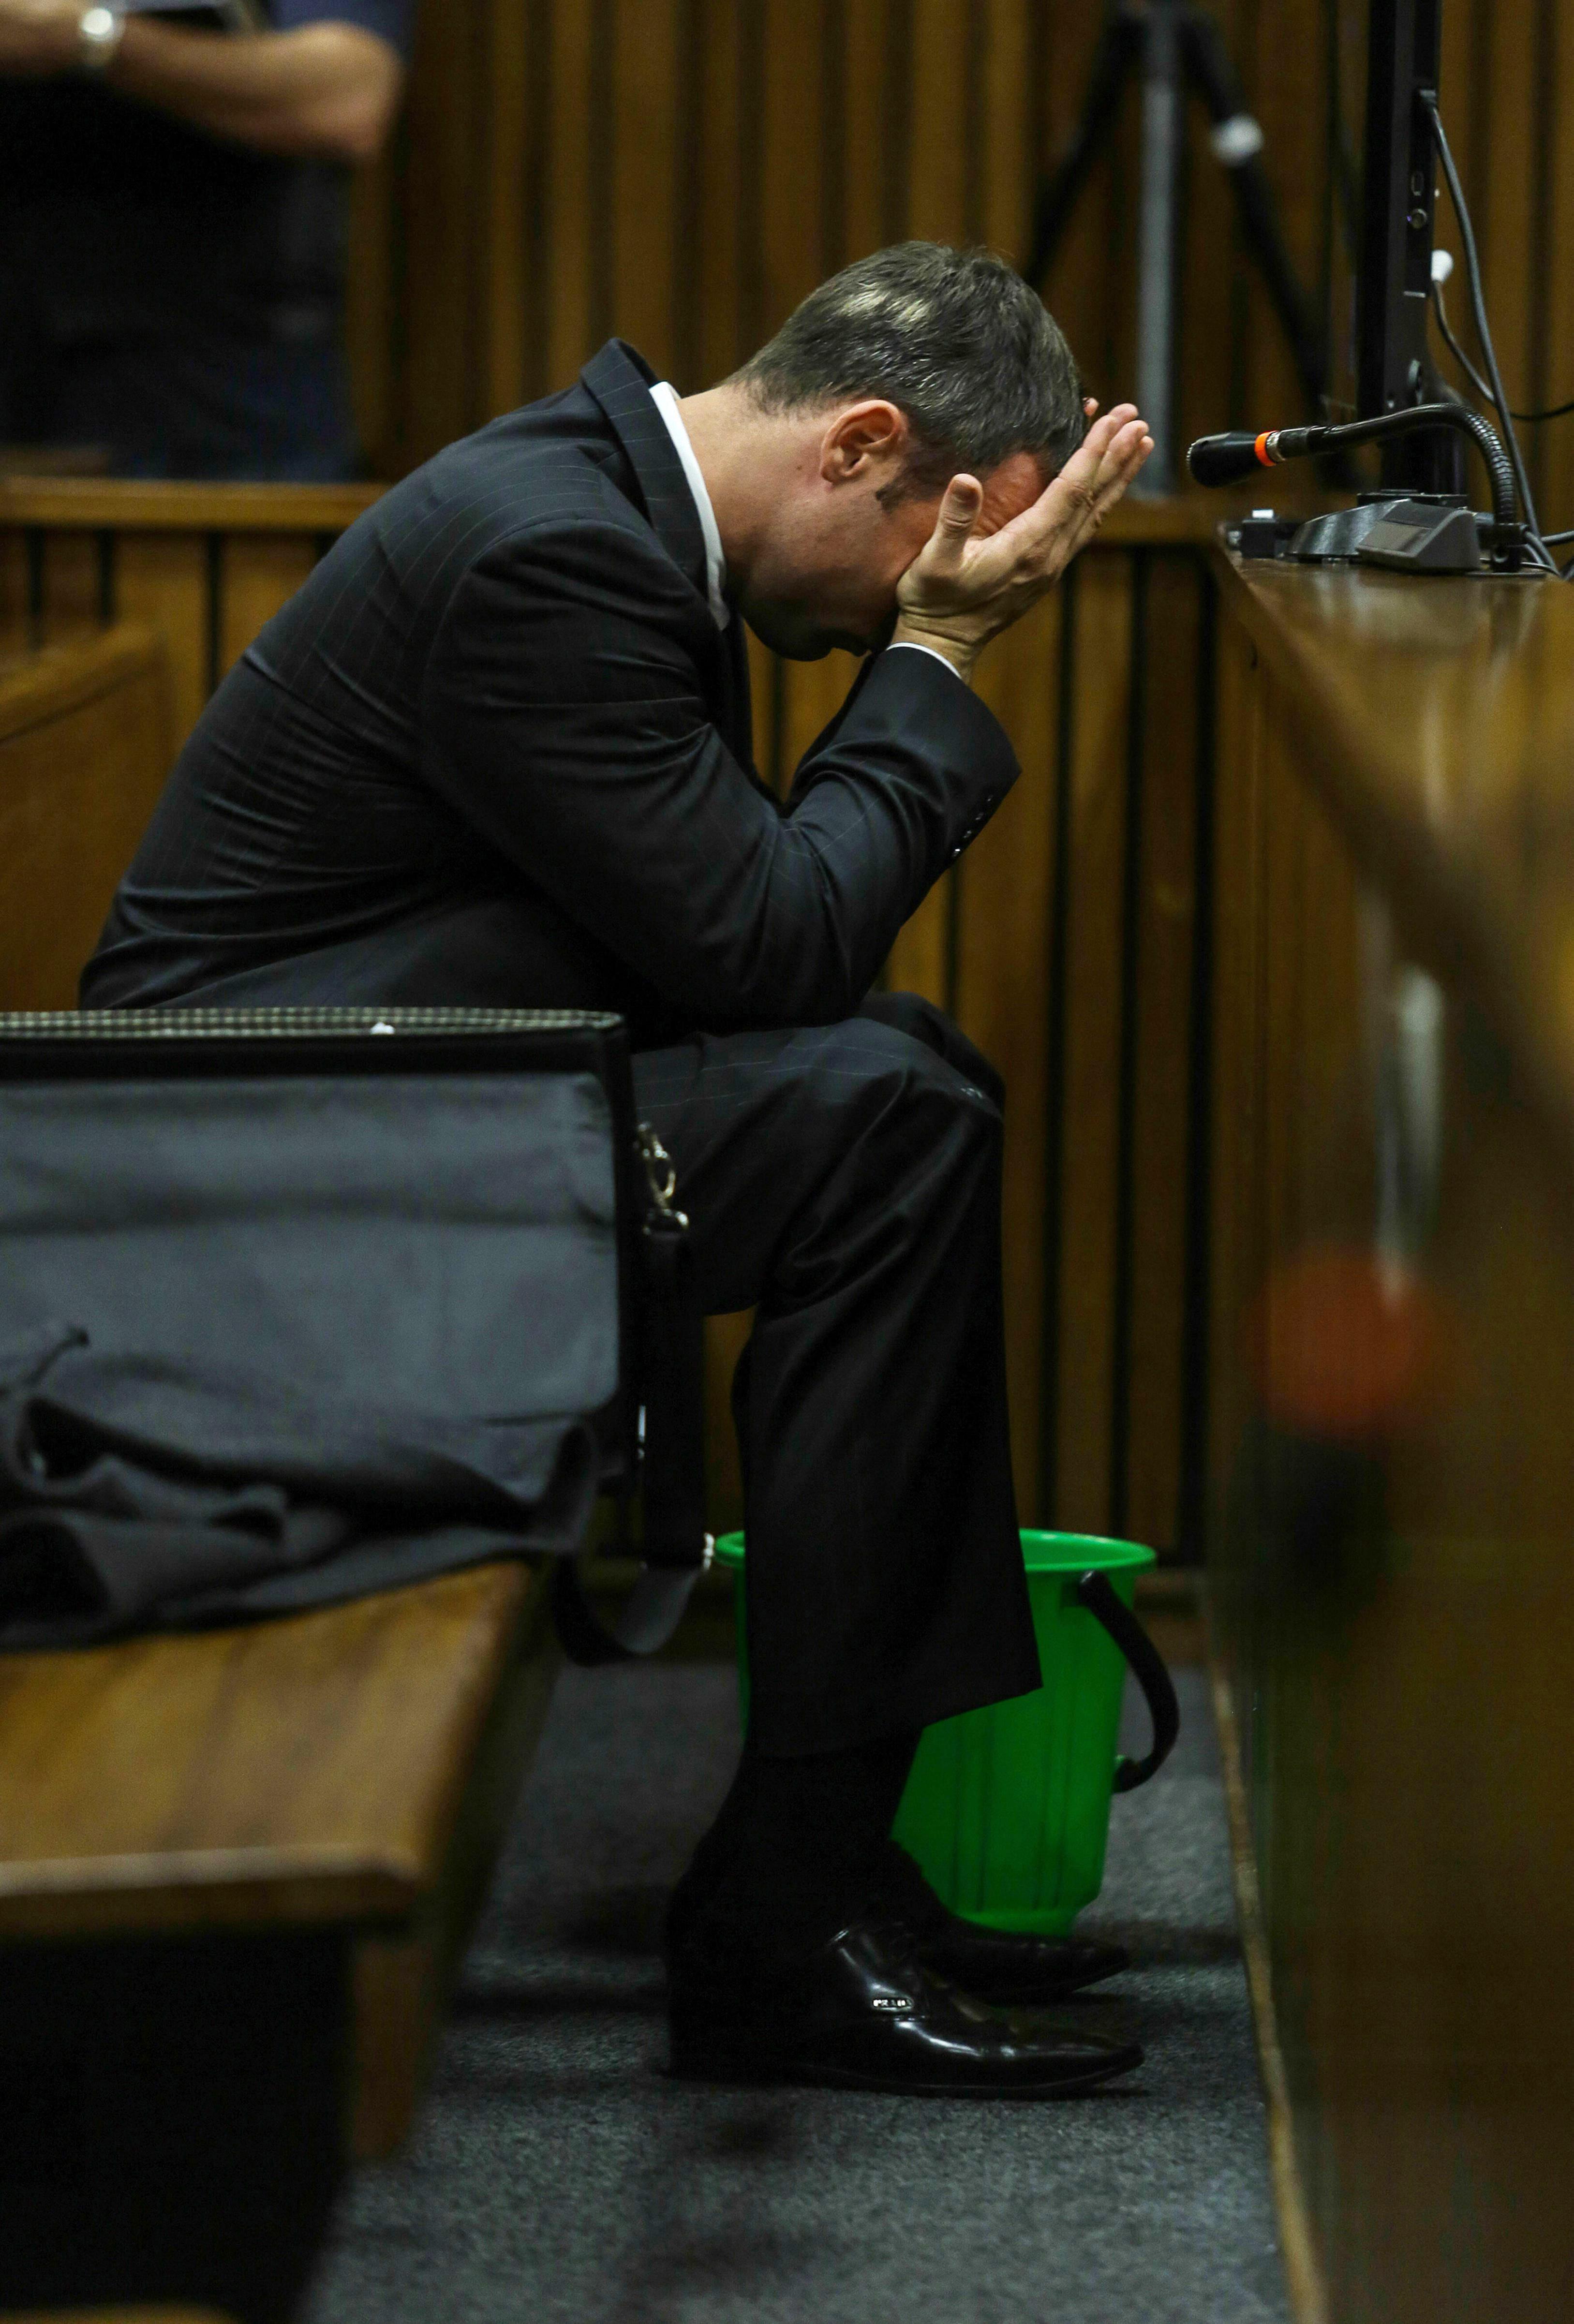 Pistorius at Pretoria High Court on March 11, 2014, in Pretoria, South Africa.